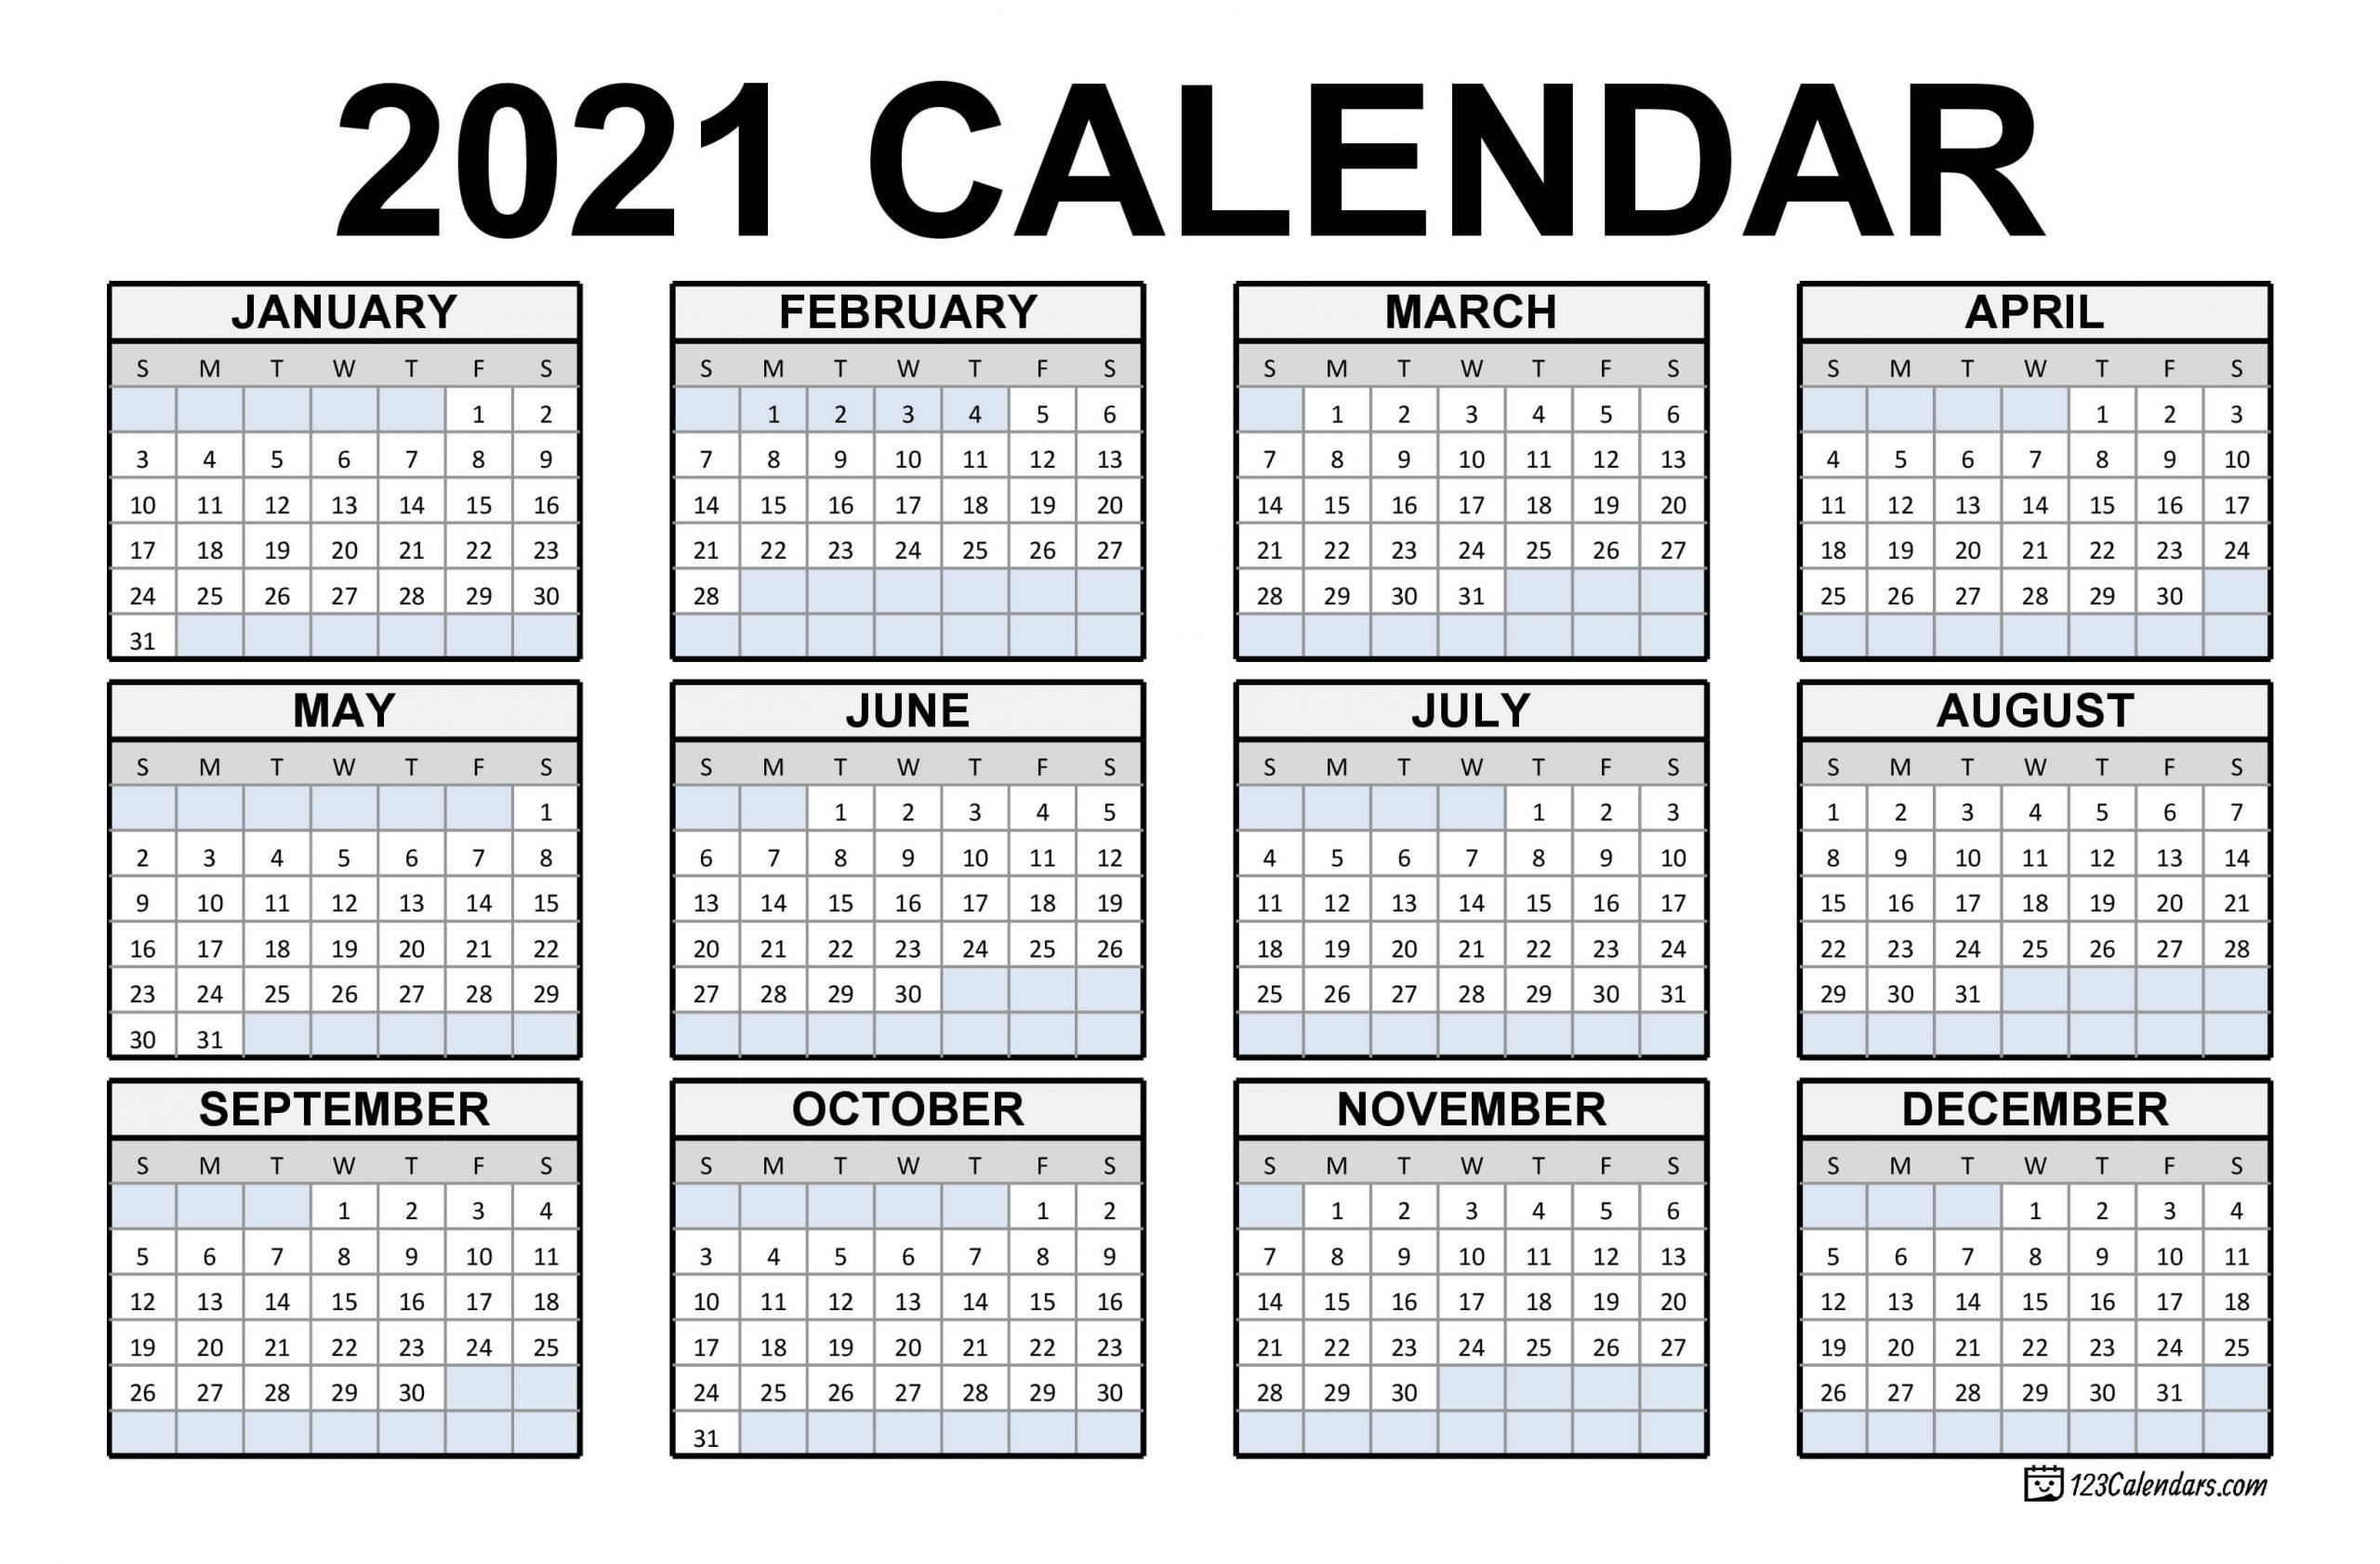 2021 Printable Calendar | 123Calendars within Print Pocket Size Calendar For 2020